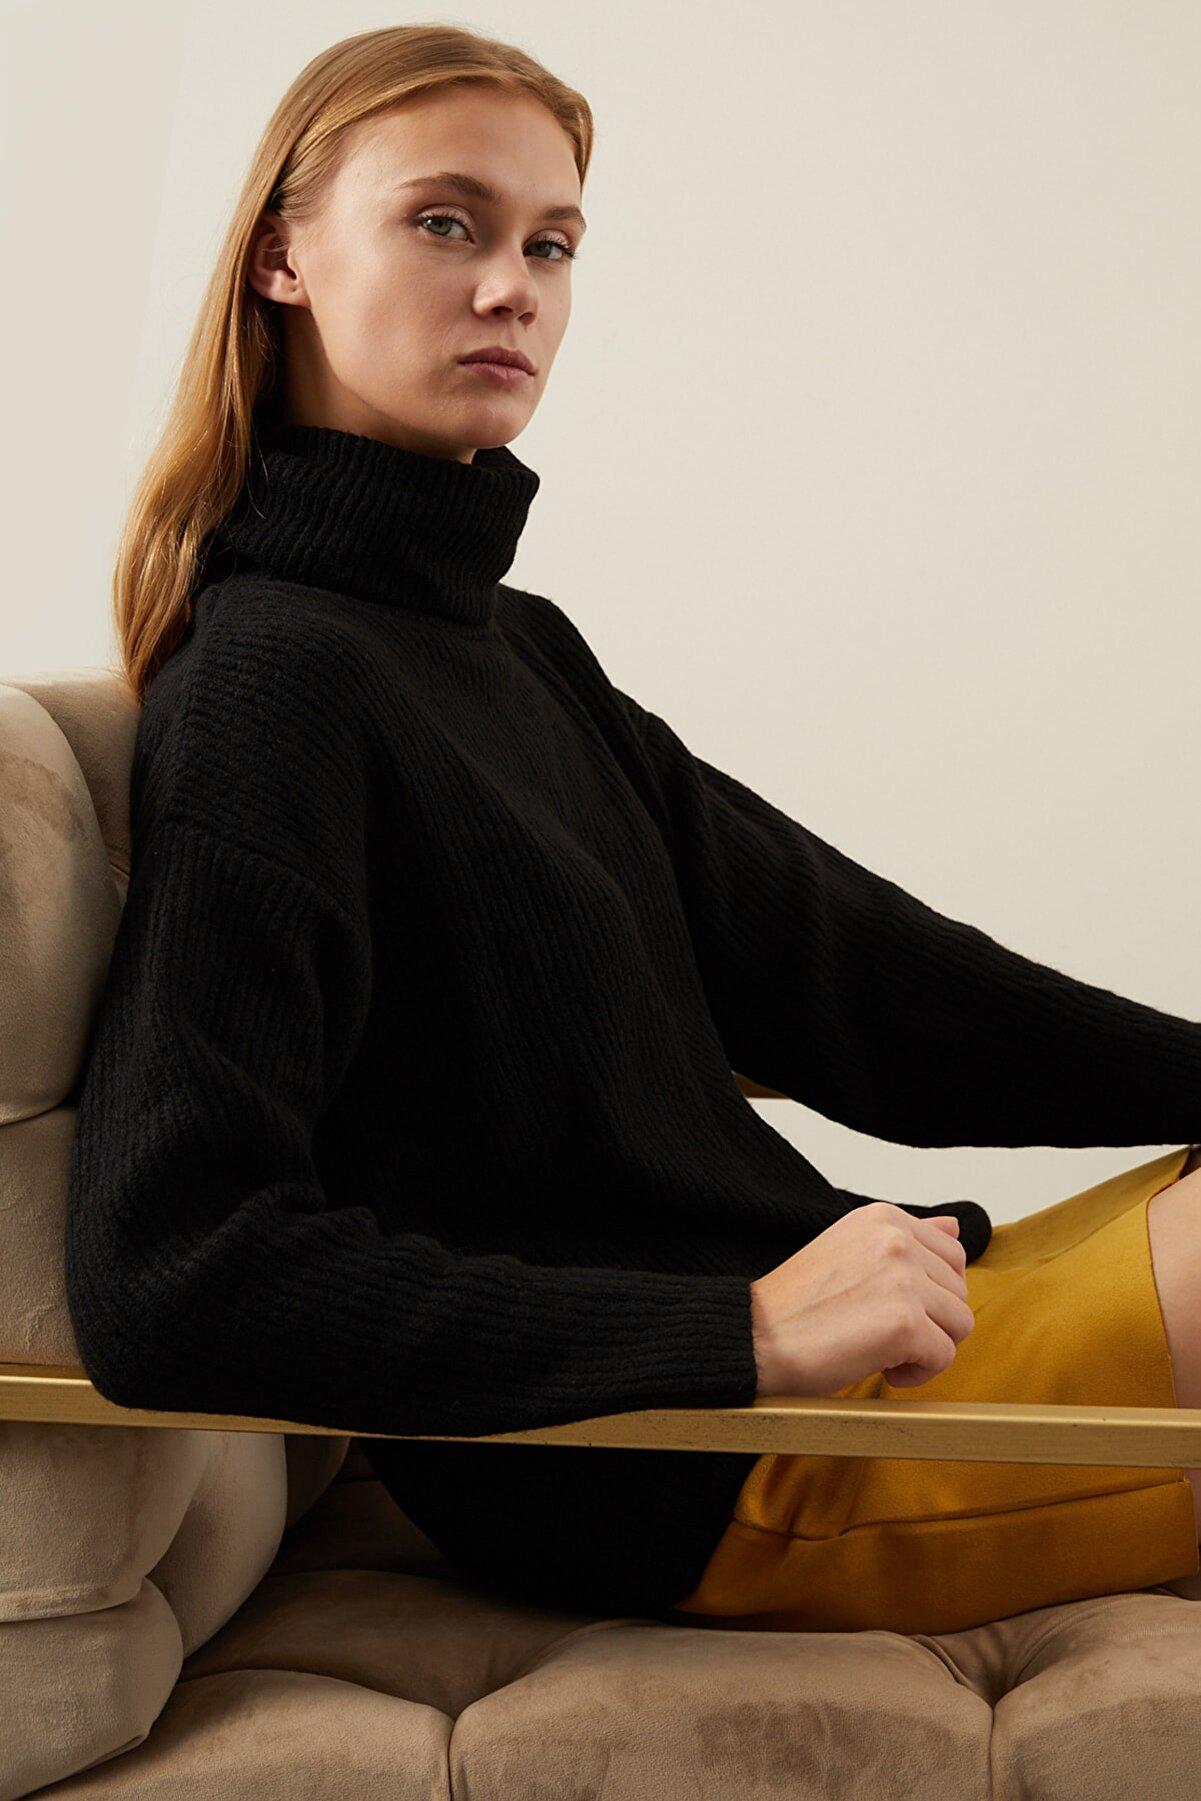 Tena Moda Kadın Siyah Fitilli Boğazlı Yumoş Triko Kazak